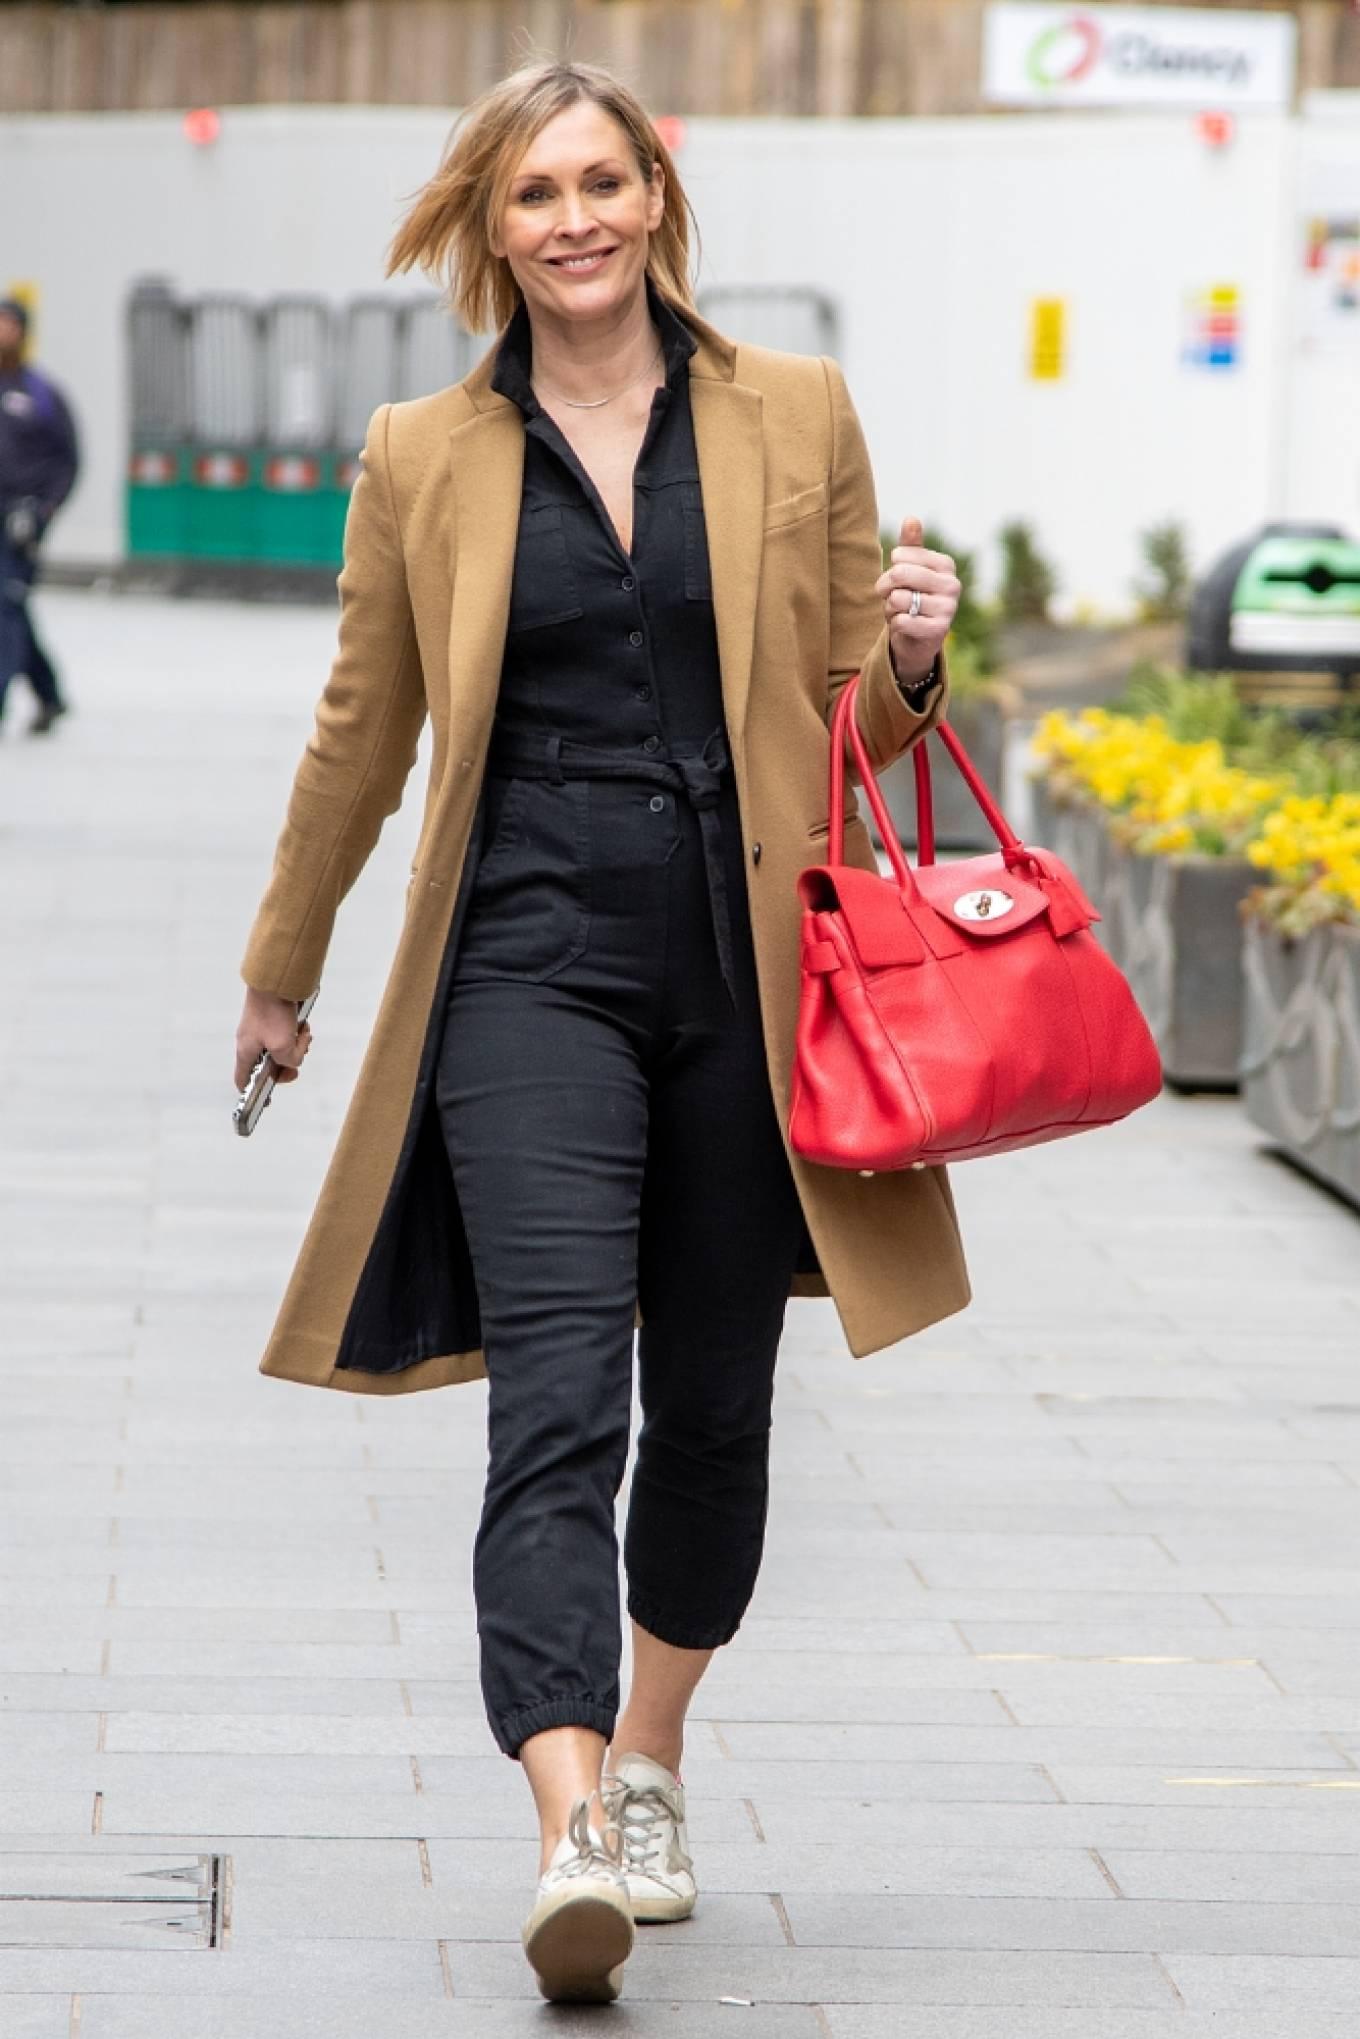 Jenni Falconer 2021 : Jenni Falconer – Seen after radio show in London-03